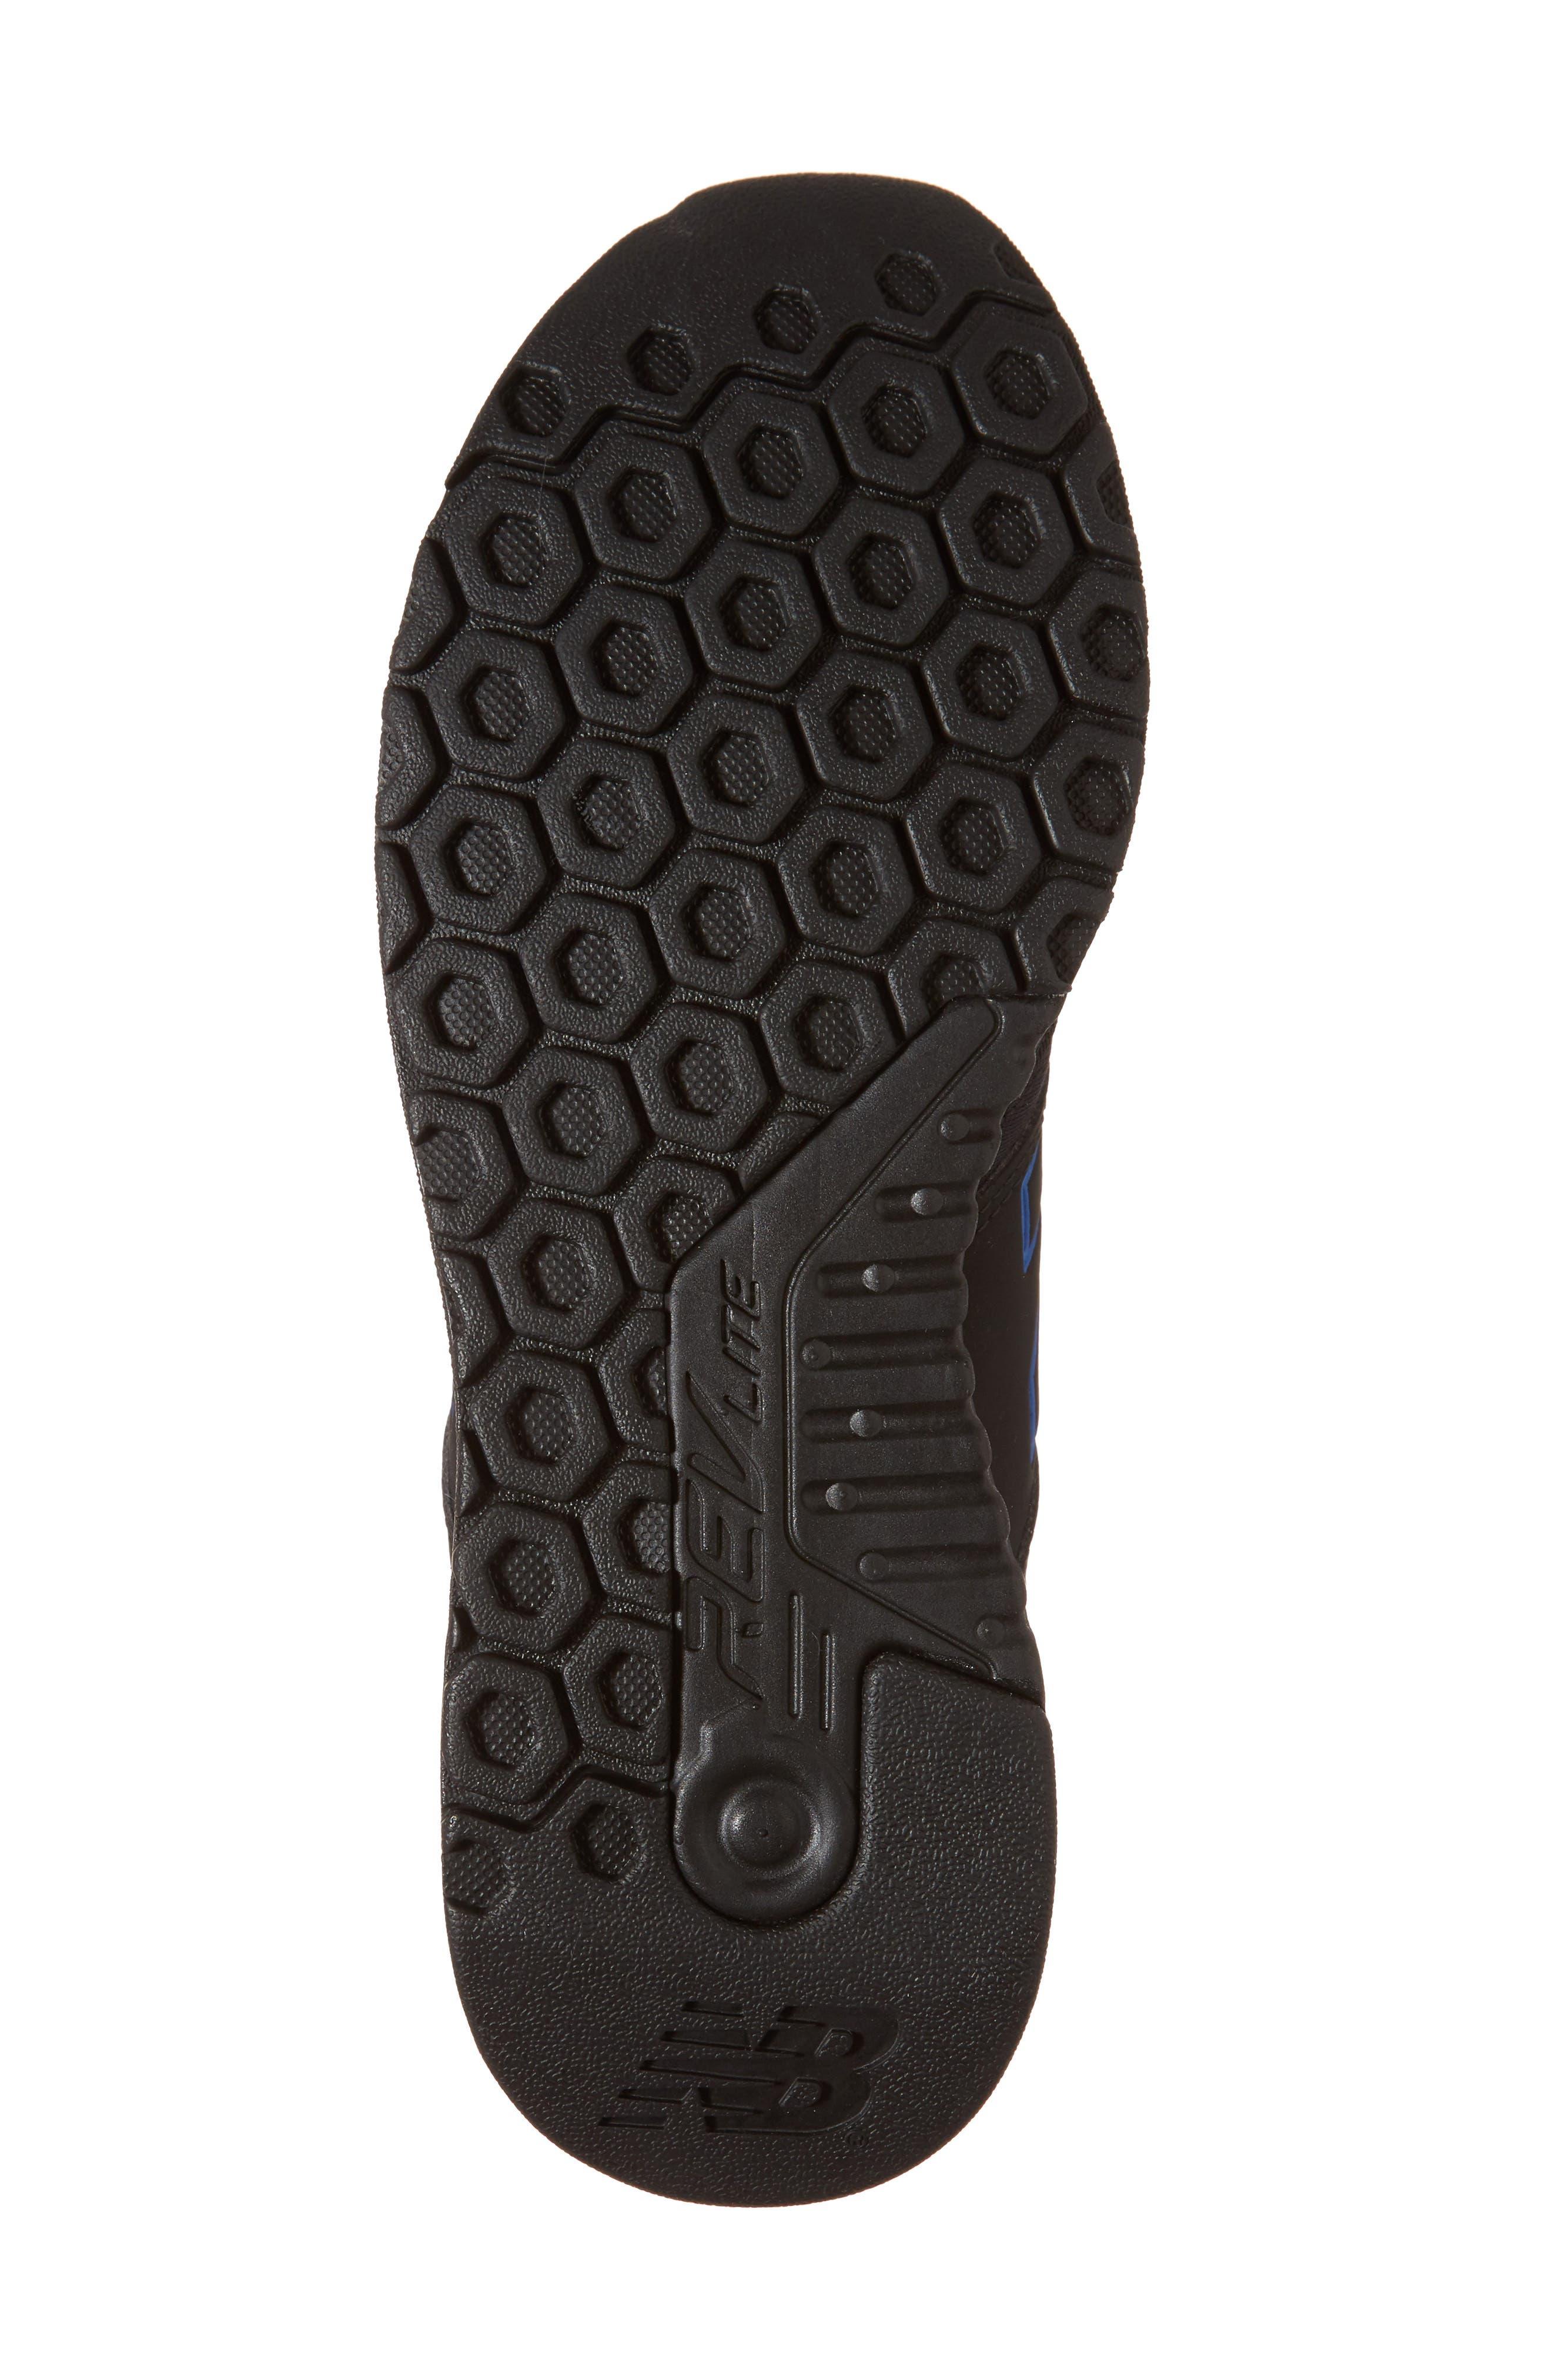 247 Sneaker,                             Alternate thumbnail 6, color,                             Black